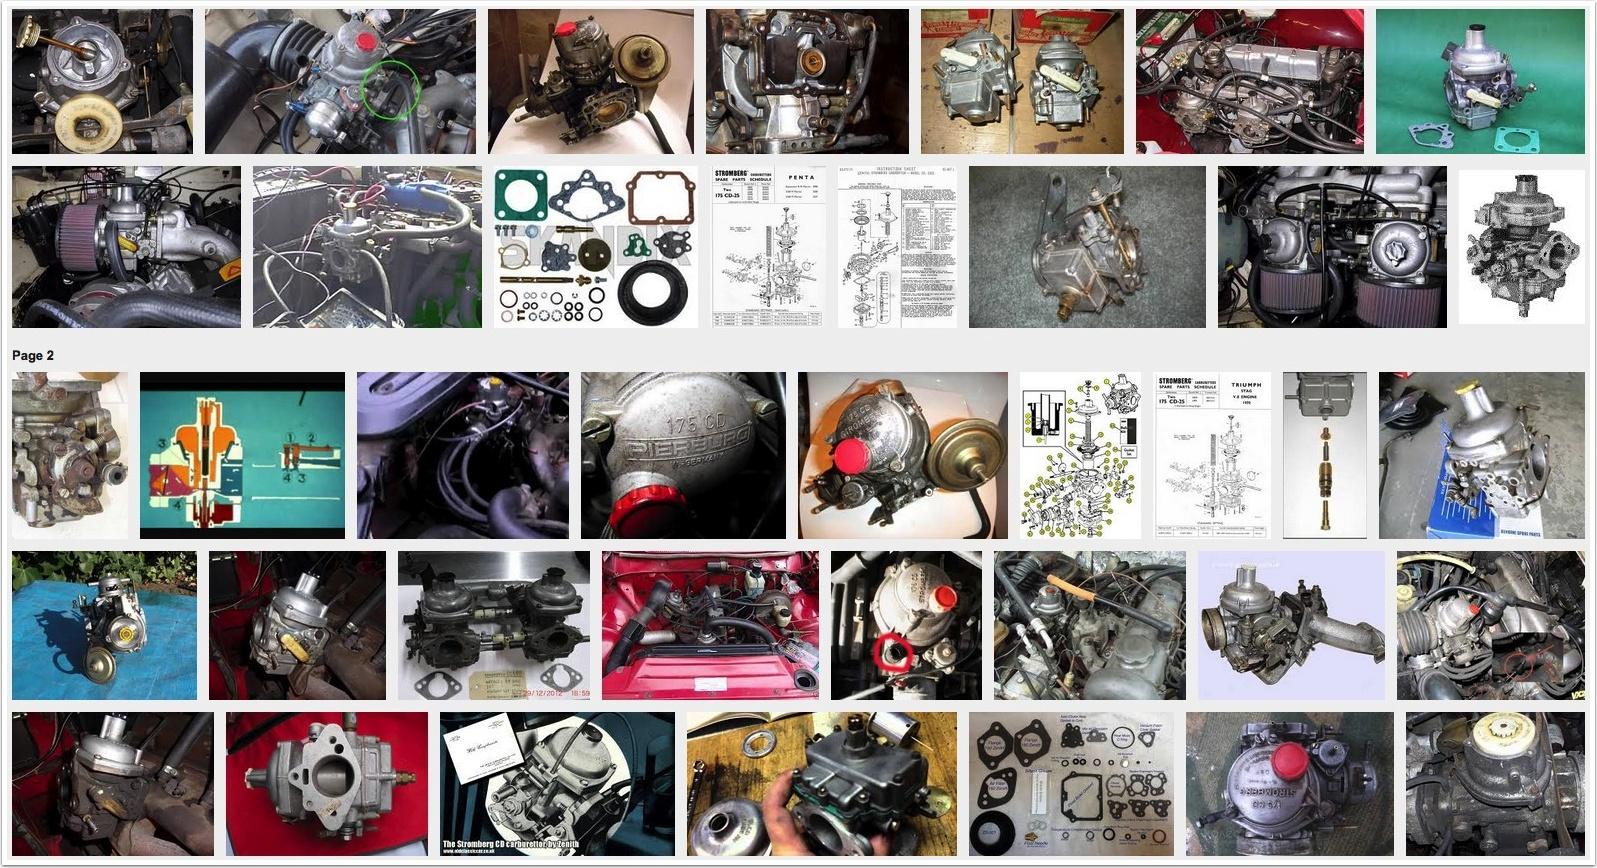 (C) Google Images